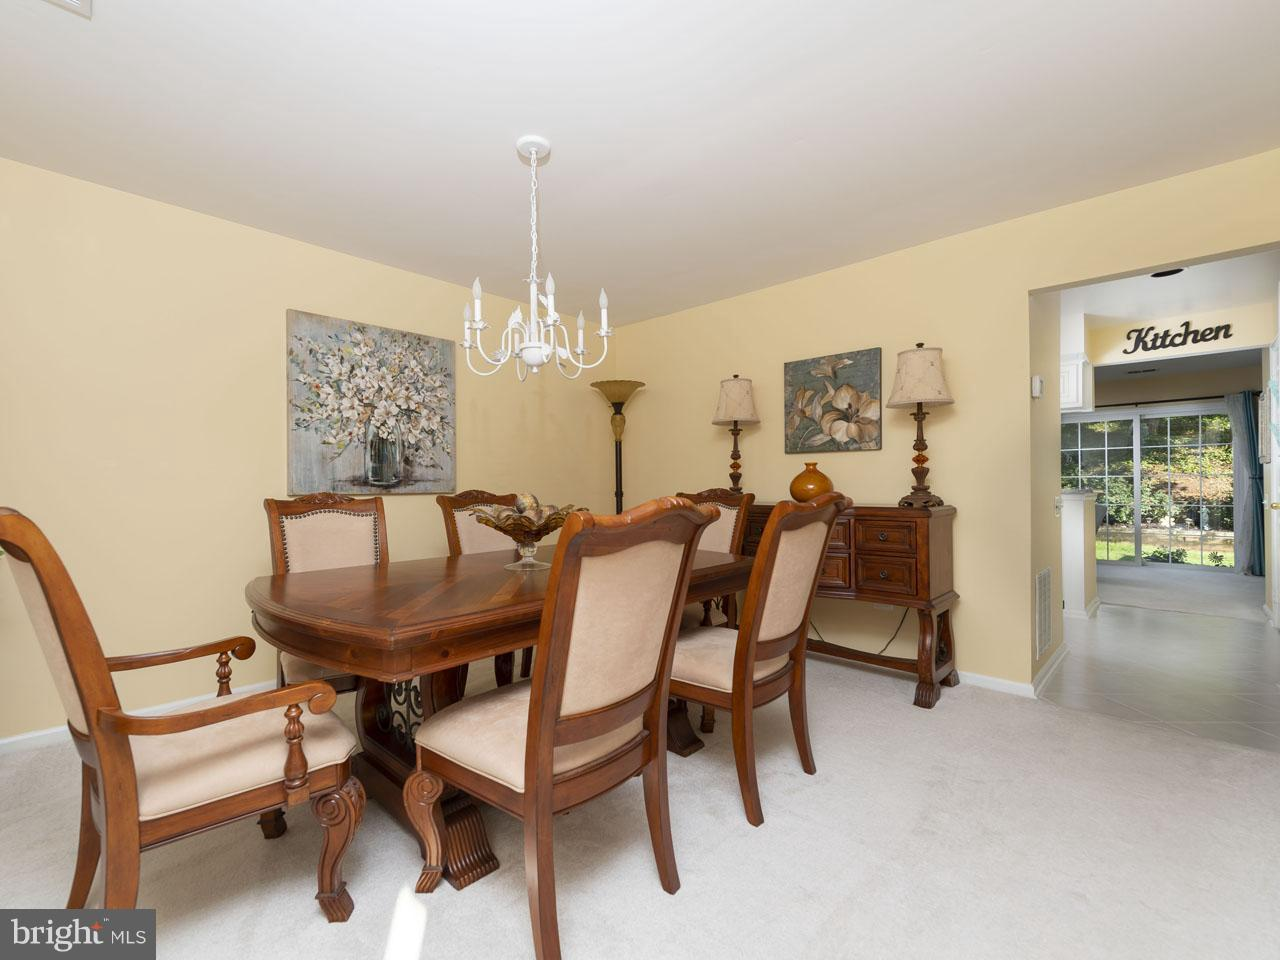 1002640508-300537944255-2021-07-22-05-00-37     Pinecrest   Alexandria Delaware Real Estate For Sale   MLS# 1002640508  - Best of Northern Virginia